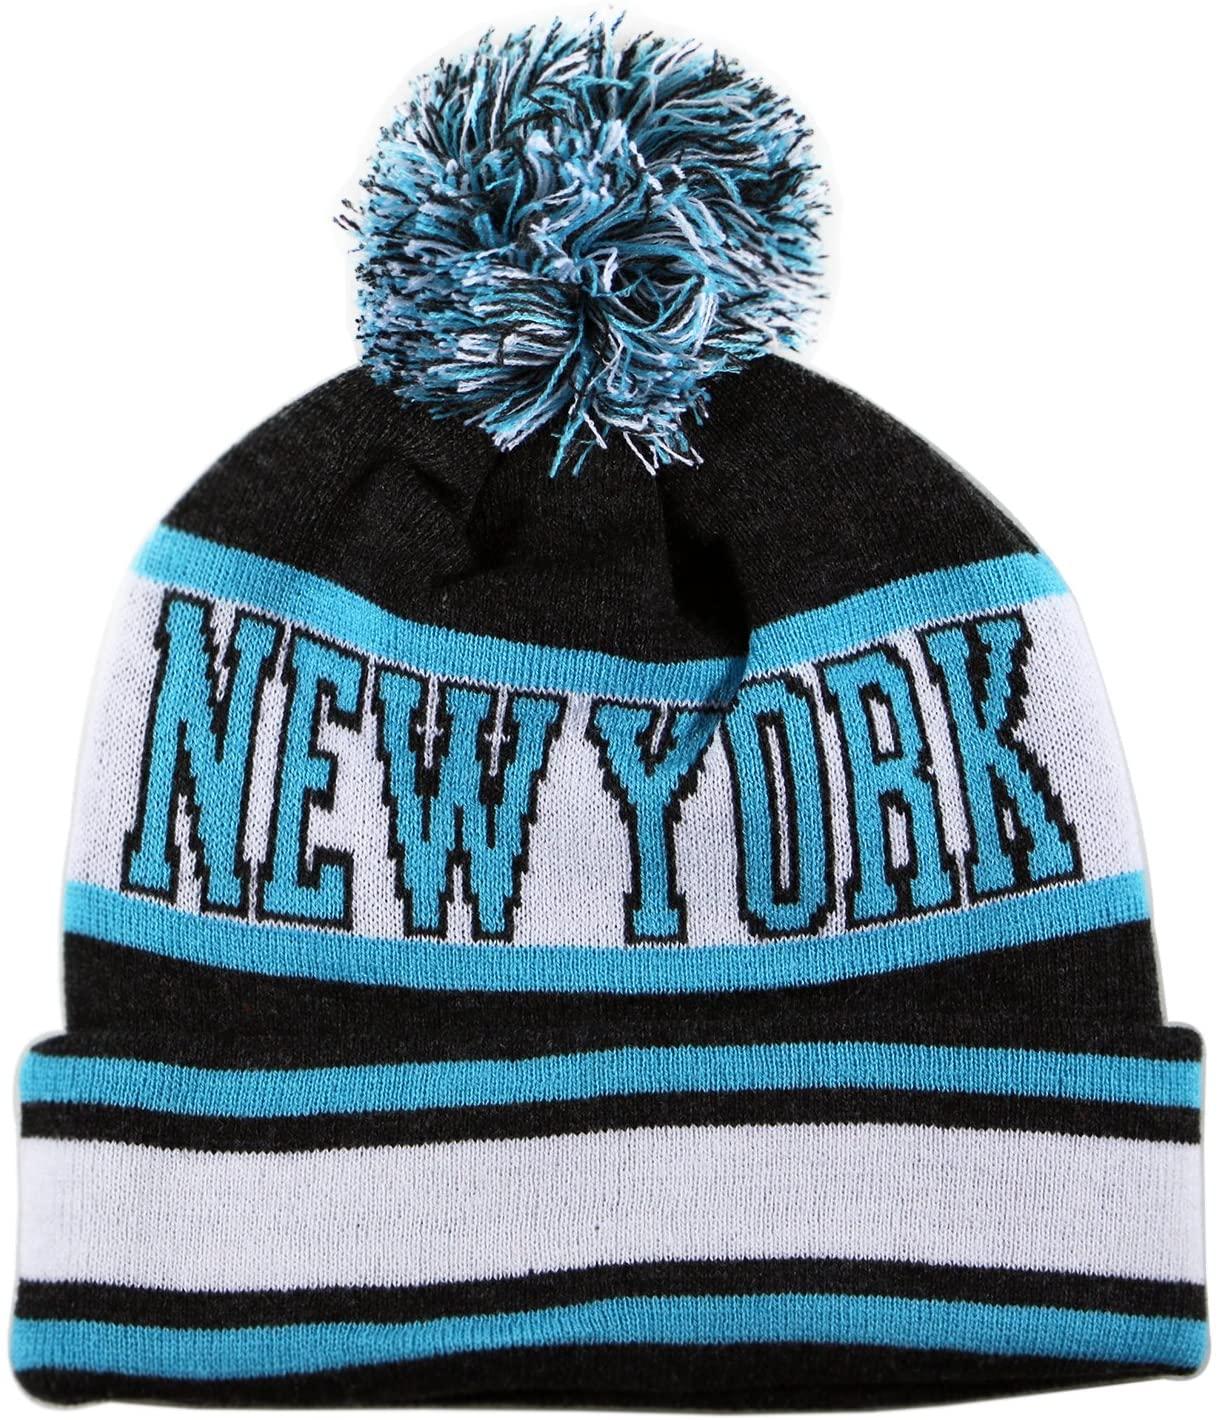 City Hunter Sk1130 New York Stripes Pom Pom Beanie Hats - Dark Grey/teal